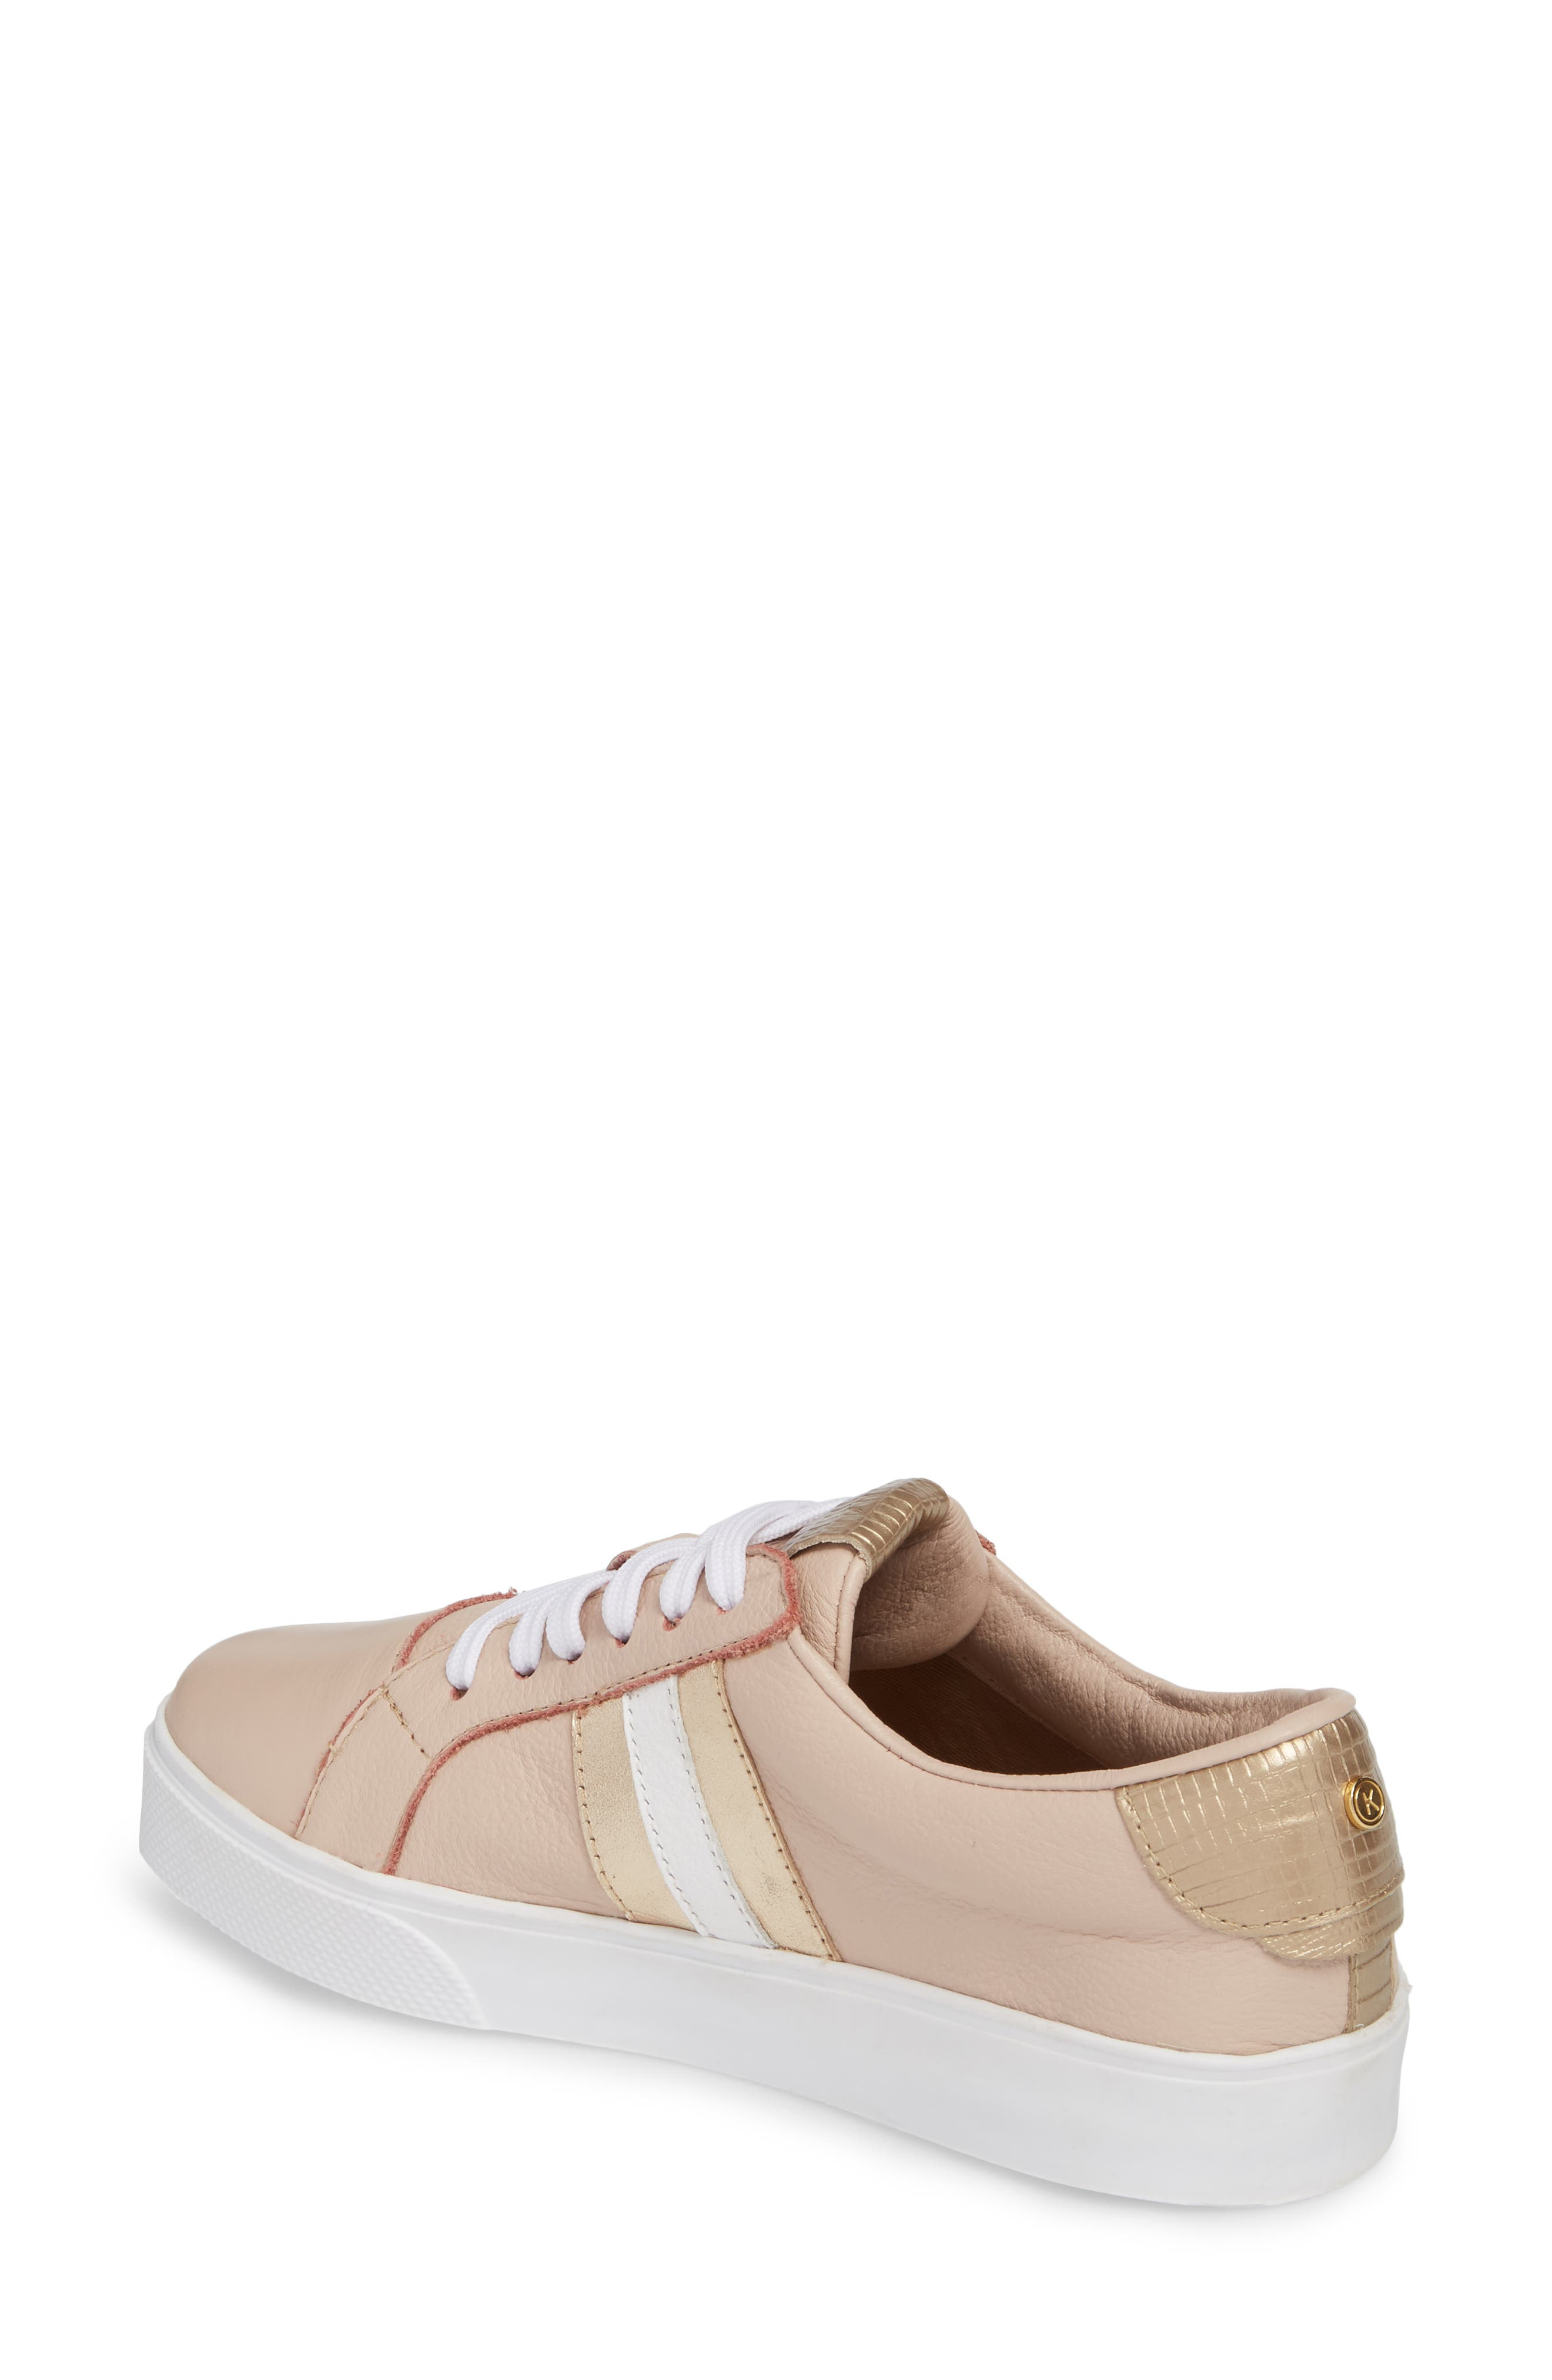 Tatacoa Low Top Sneaker,                             Alternate thumbnail 2, color,                             Blush